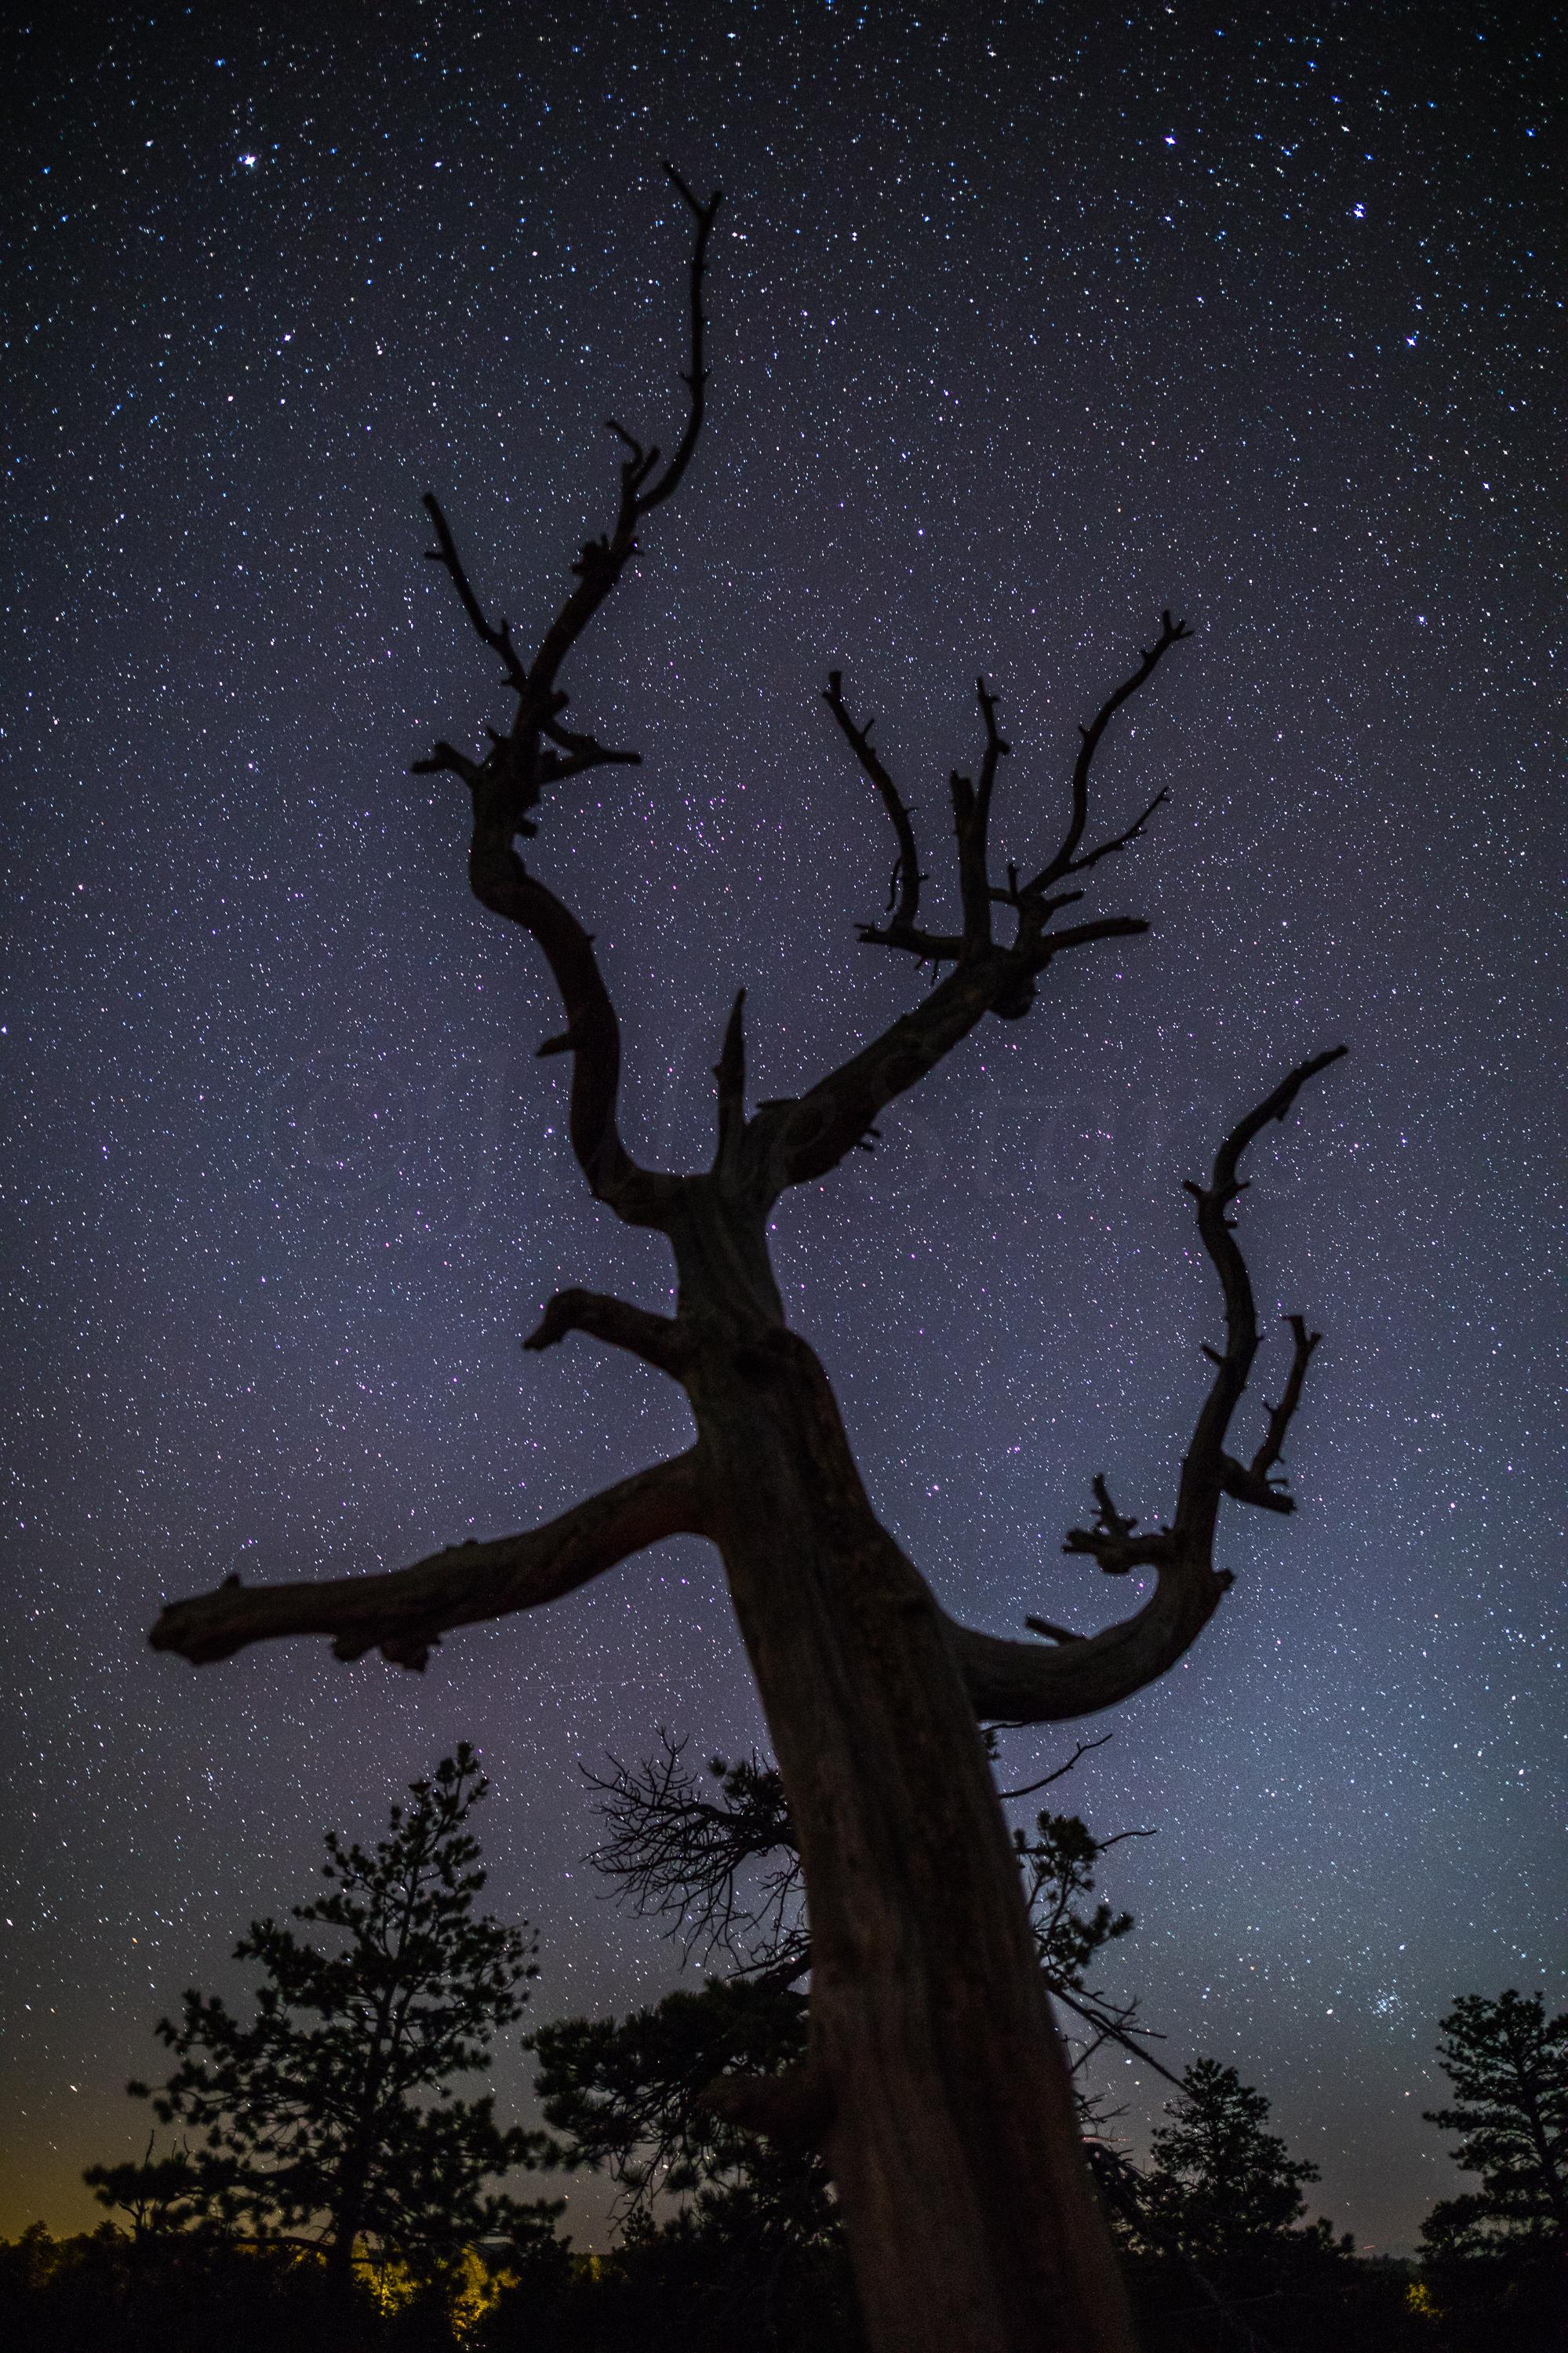 Bryce Canyon, Image # 0539